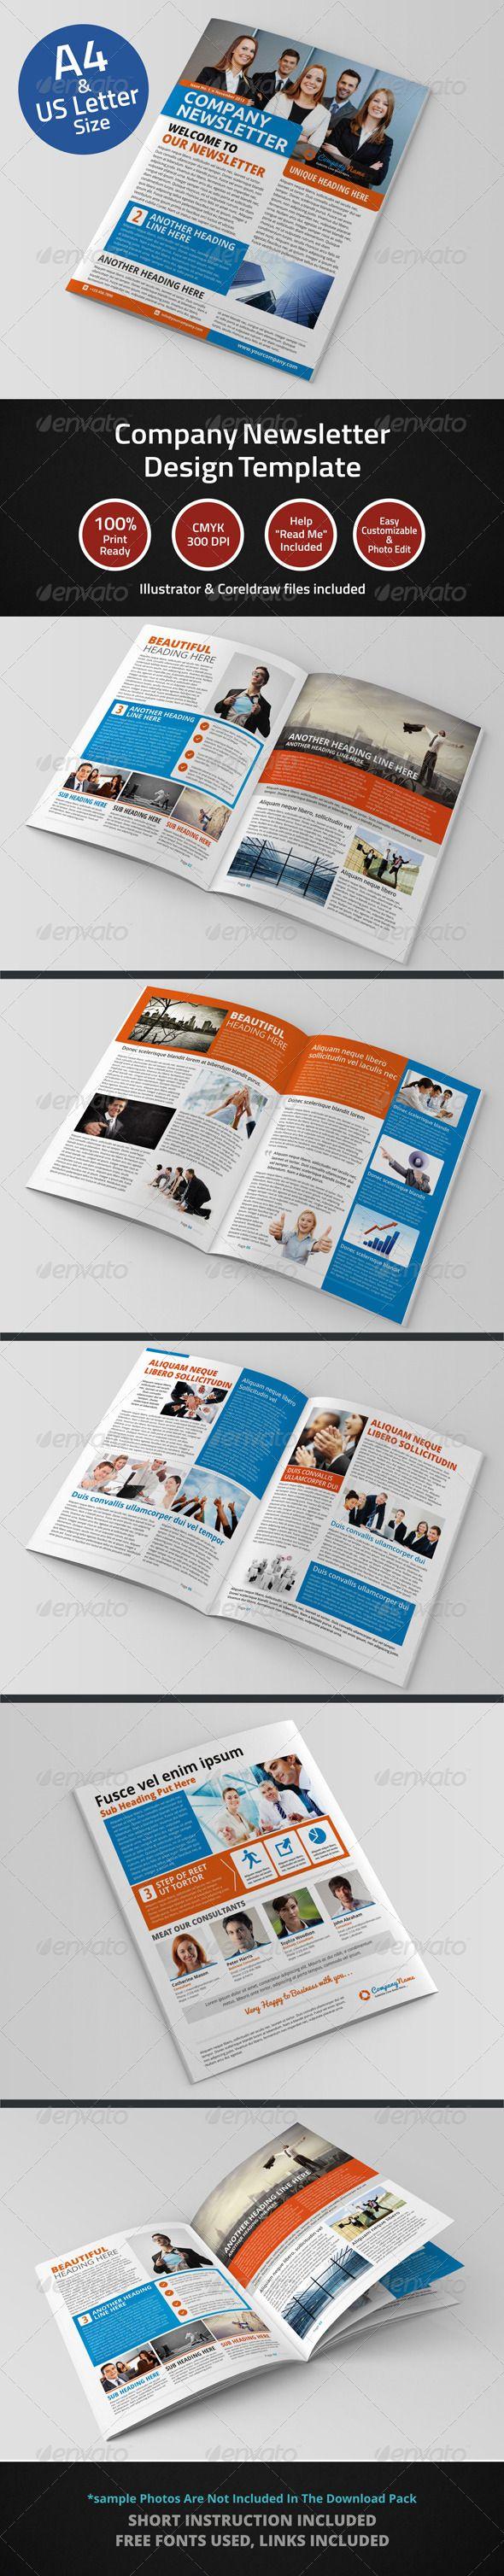 best images about newsletter inspiration newsletter design template